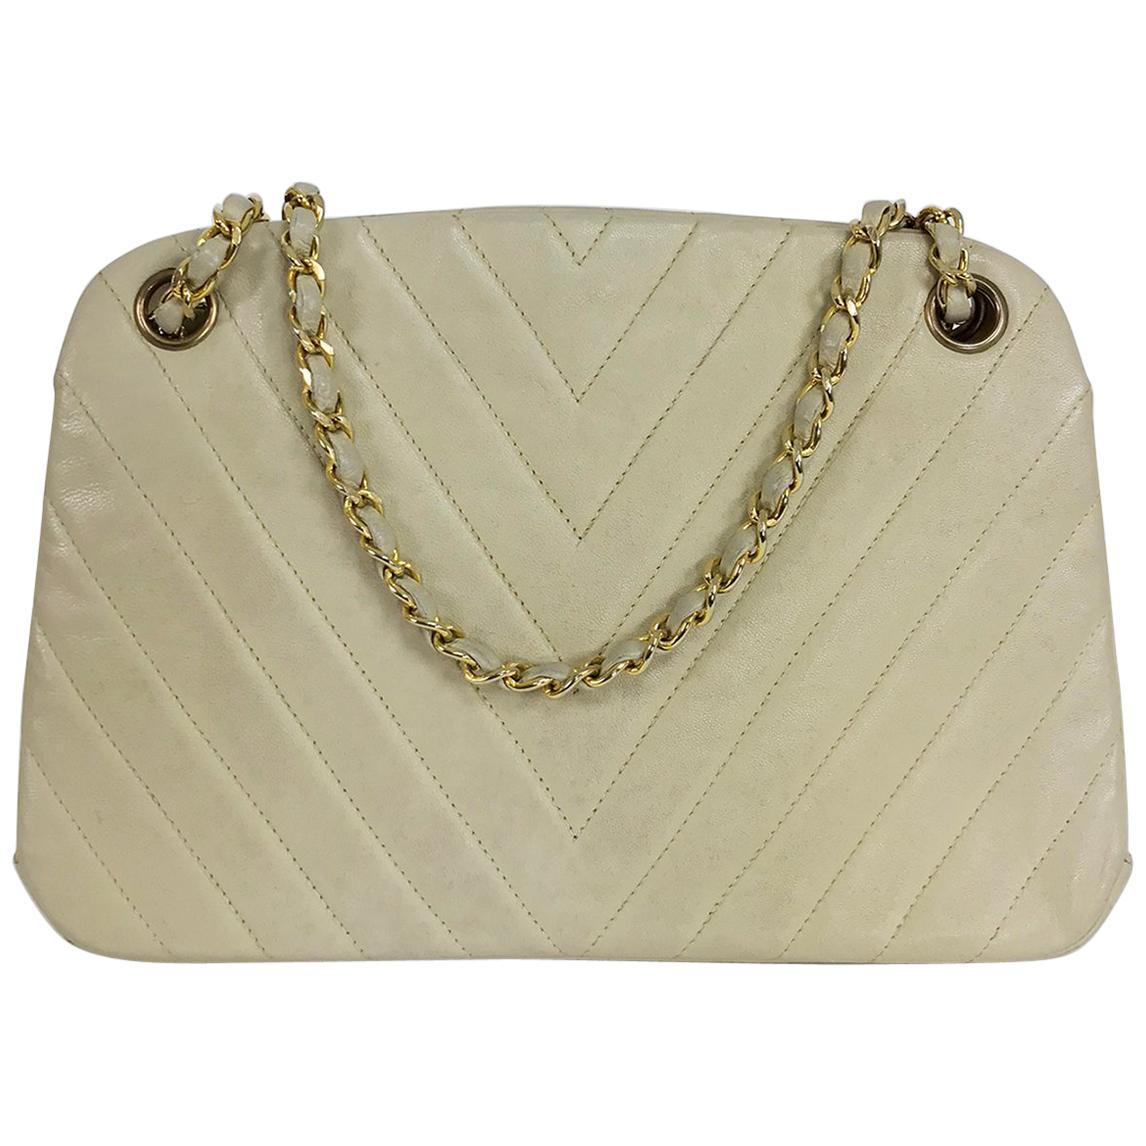 Chanel 1980s Ivory Chevron Kiss Lock Center Chain Handle Bag